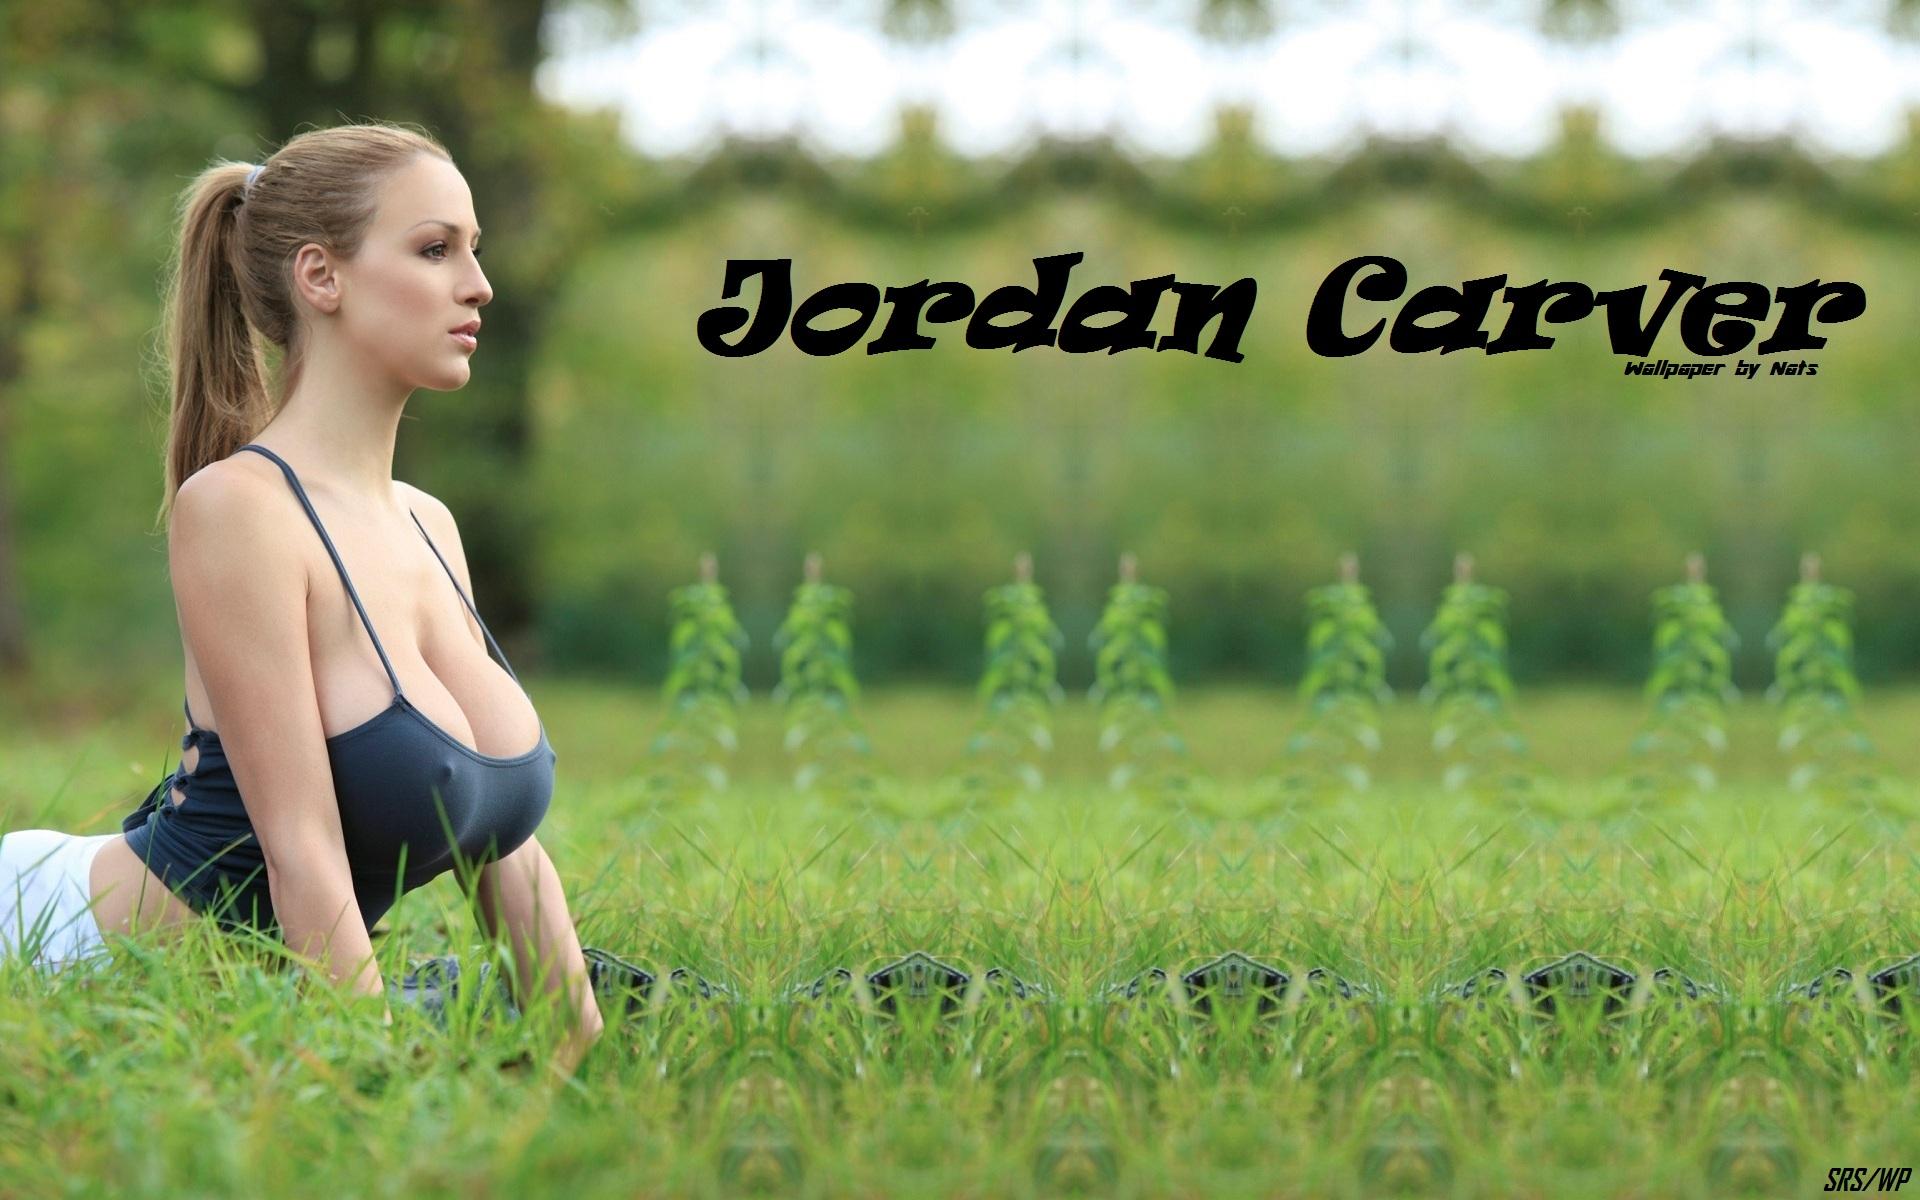 Download High Quality Jordan Carver Wallpaper Celebrities Female 1920x1200